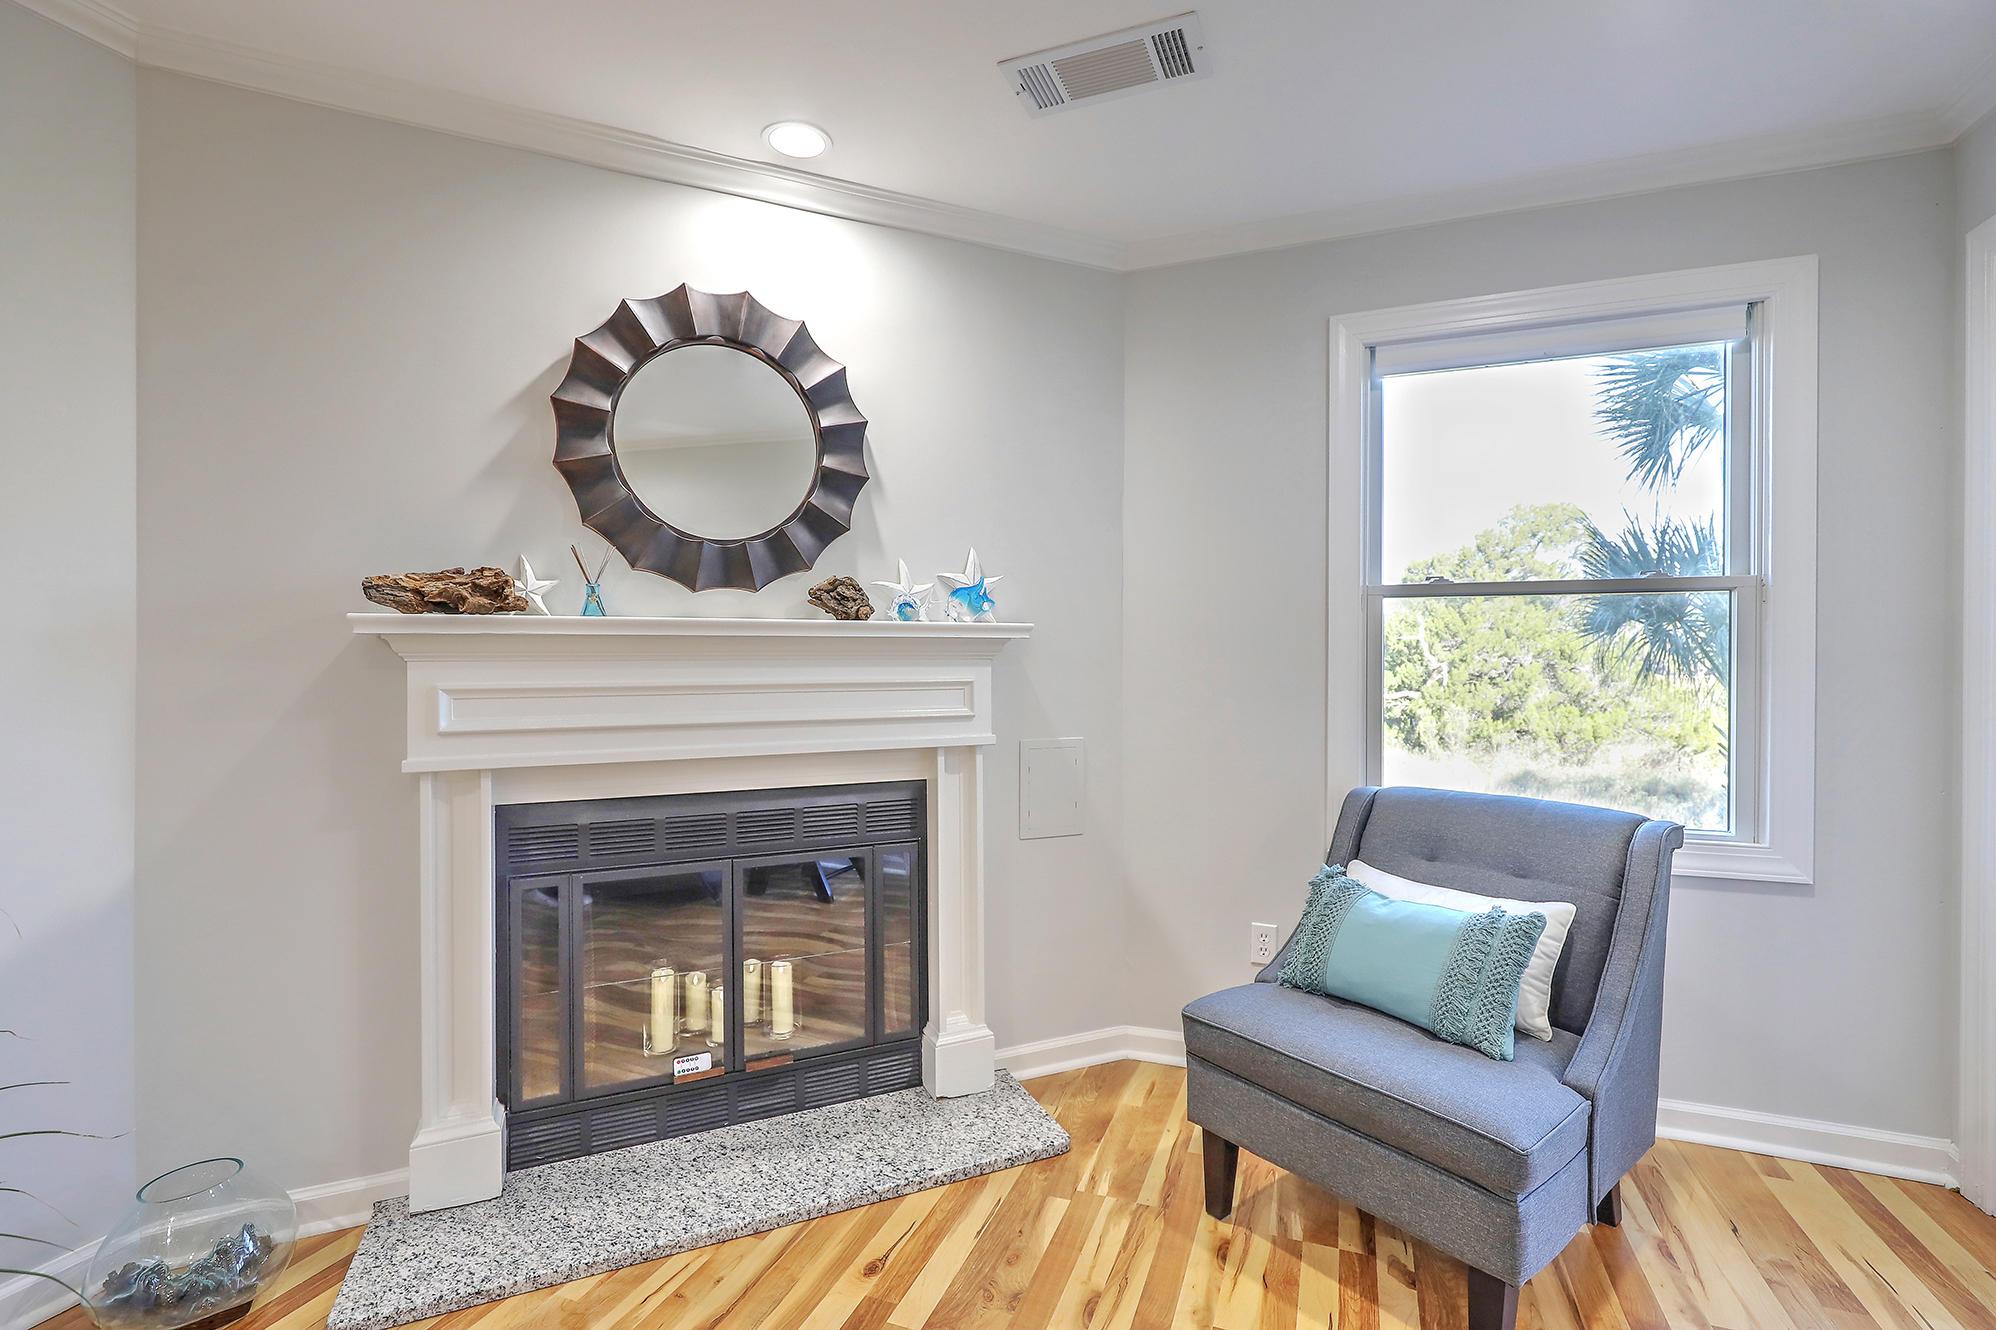 Seabrook Island Homes For Sale - 2103 Landfall, Johns Island, SC - 15